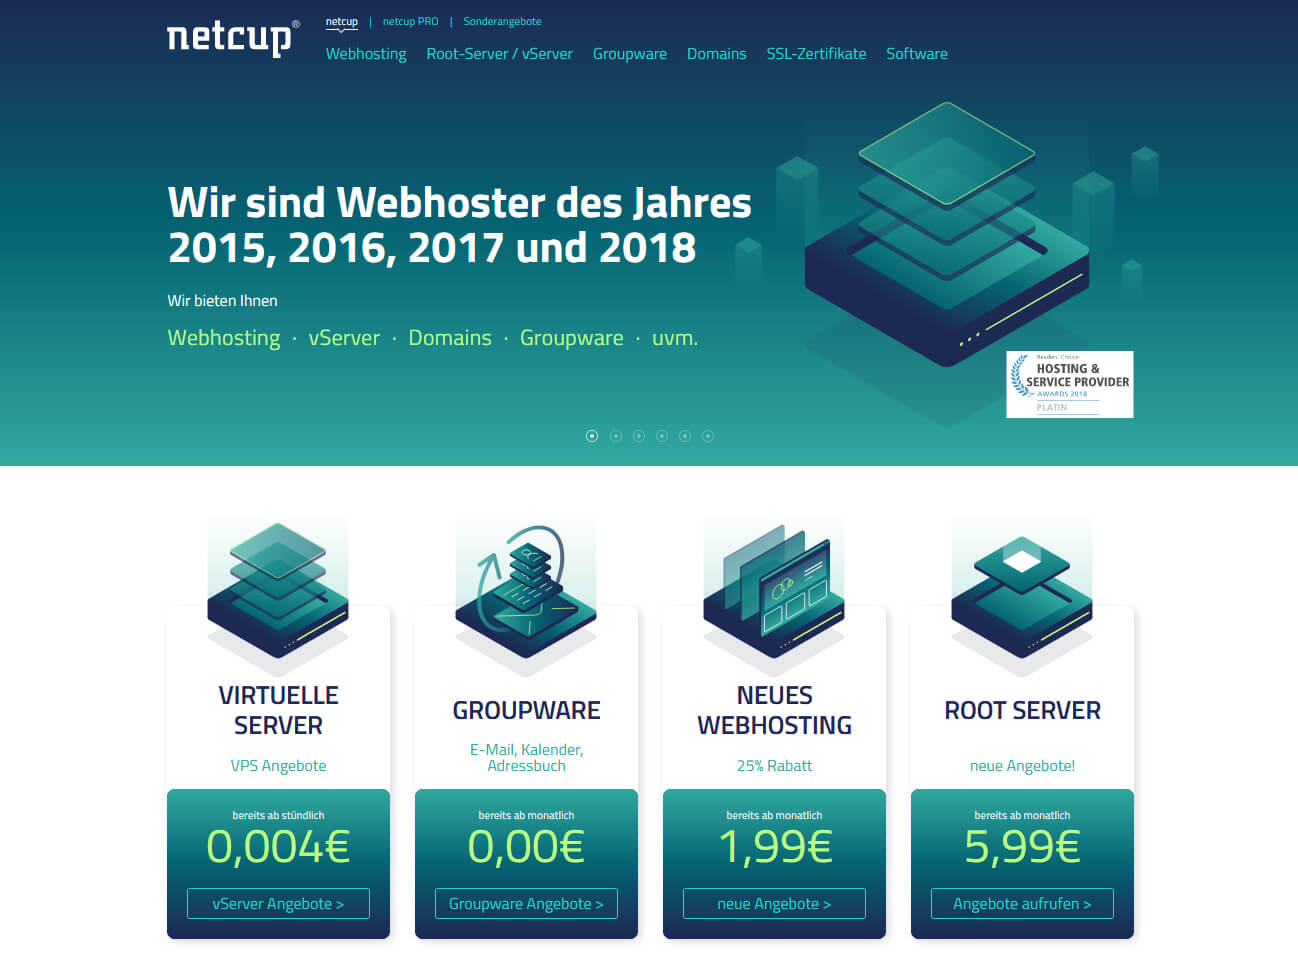 Webhosting bei Netcup